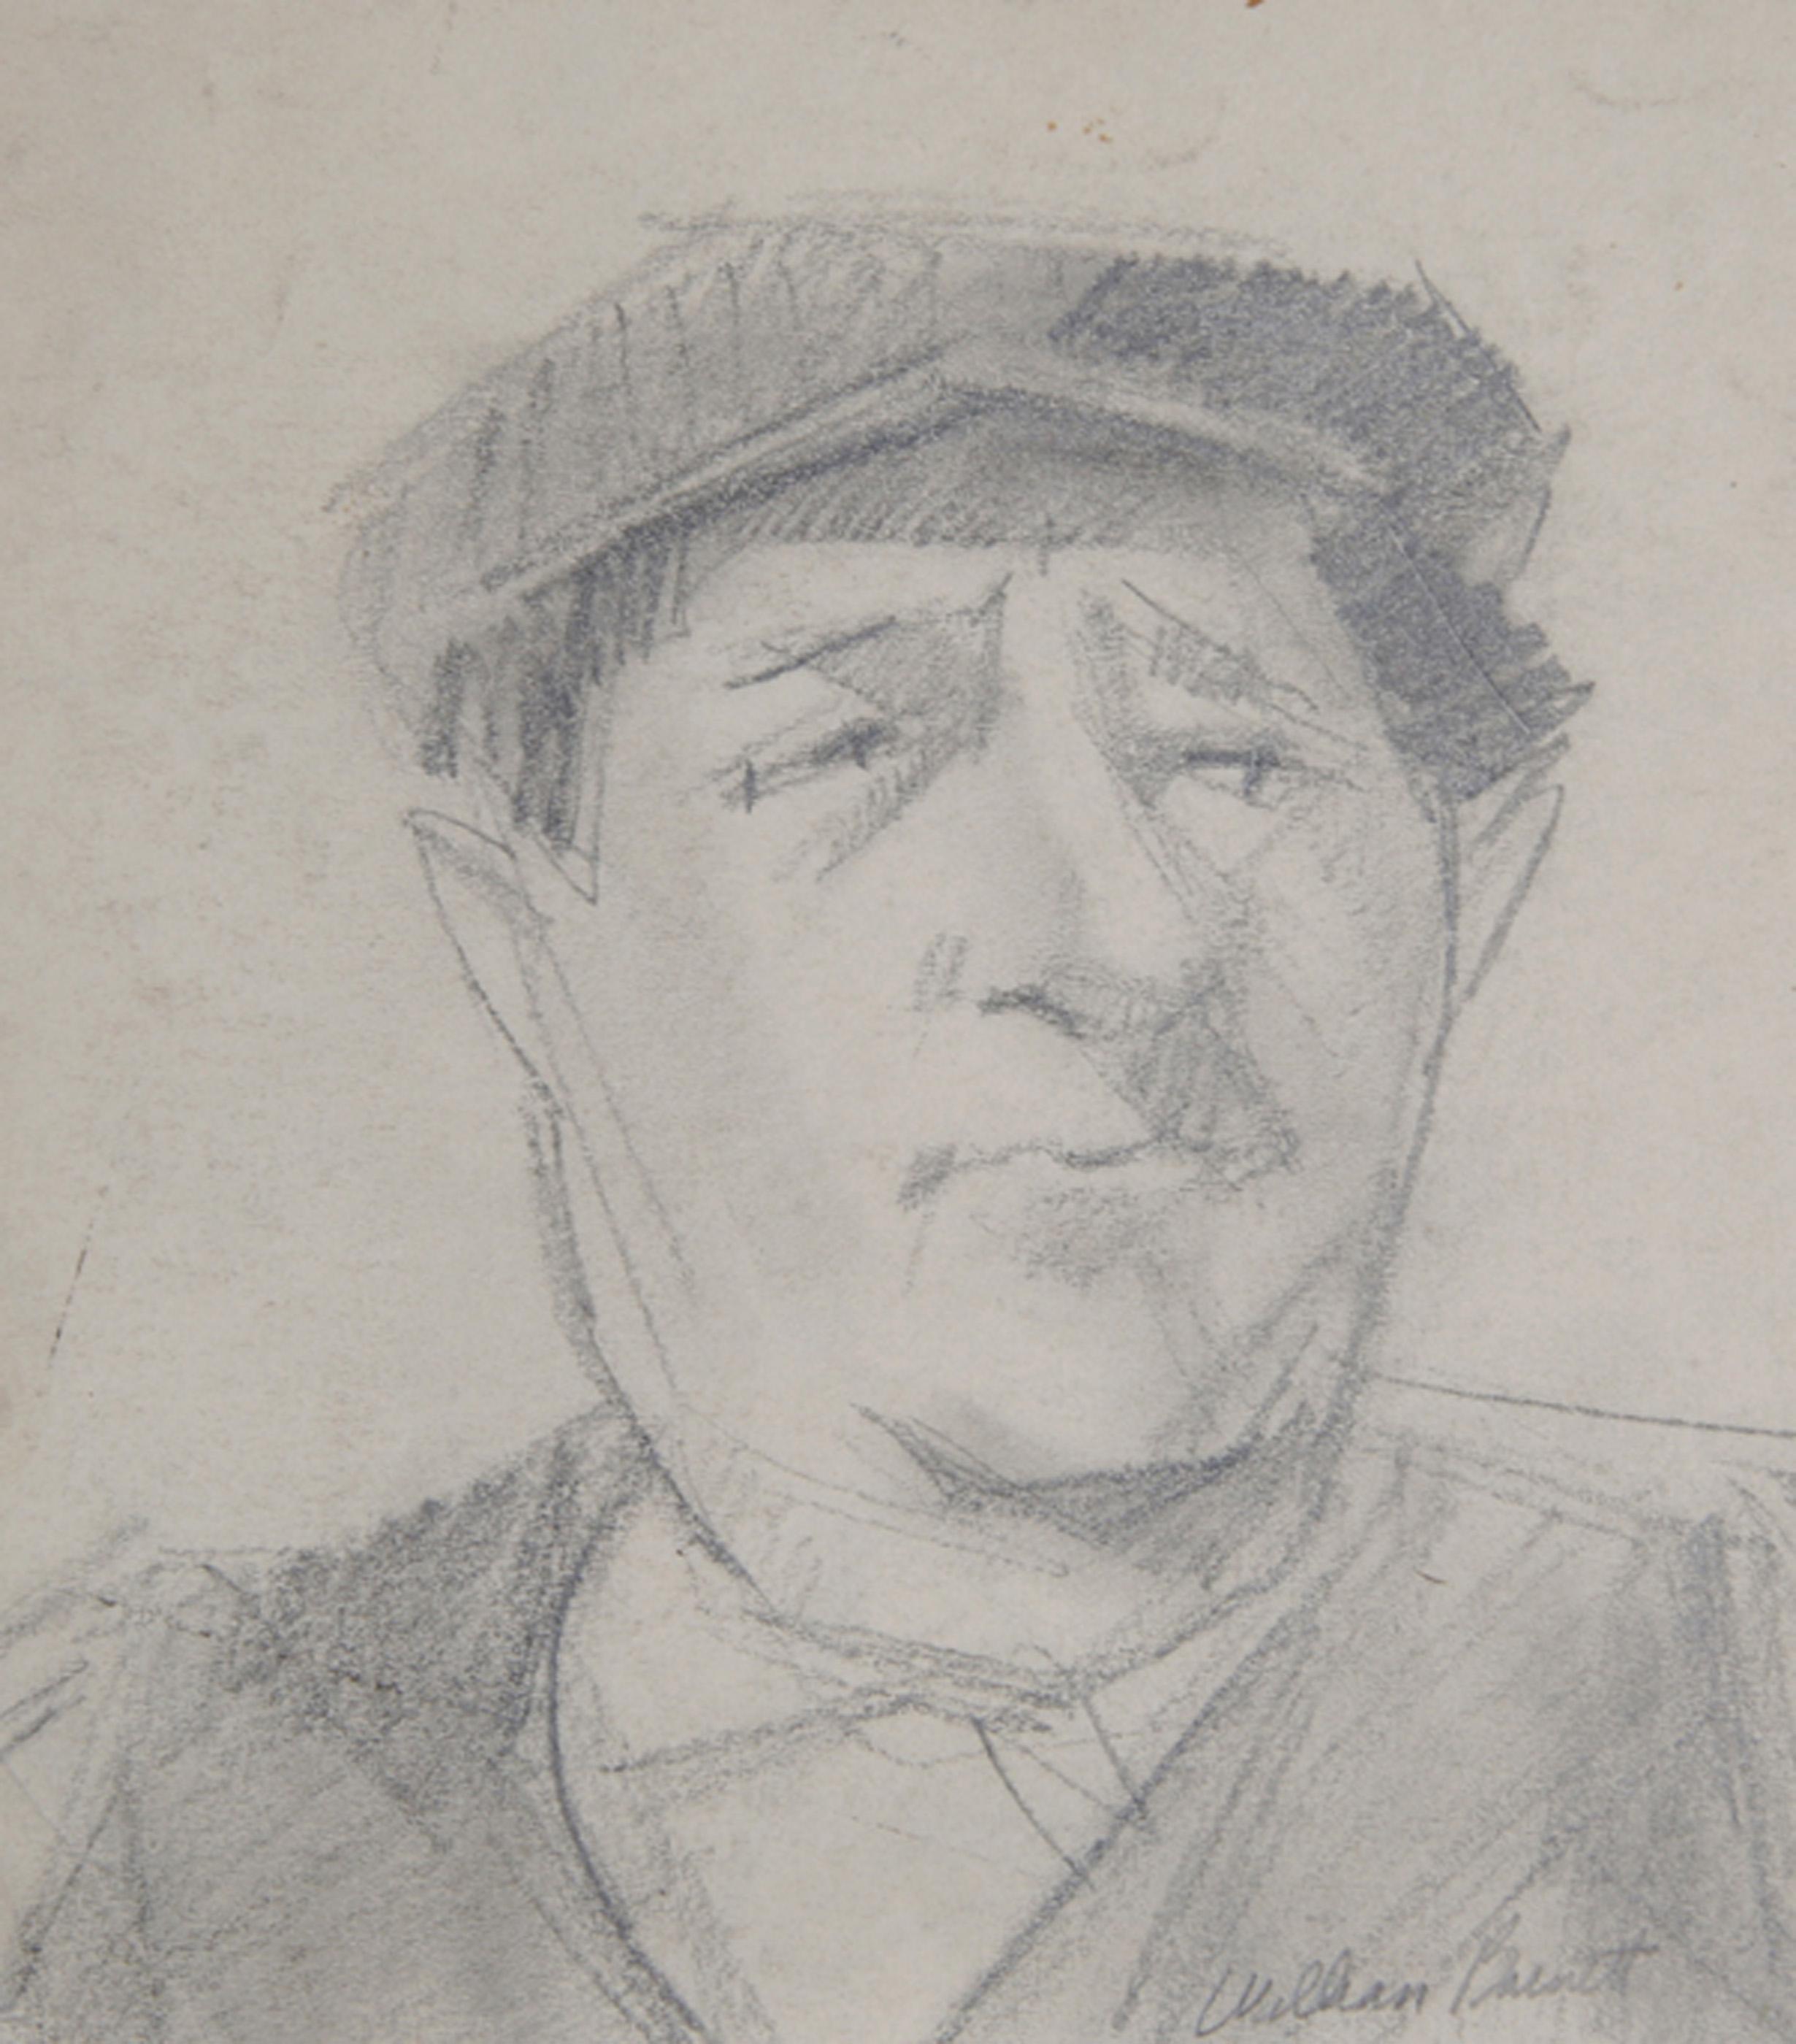 William Barnett, Portrait of Man in Cap, Graphite Drawing